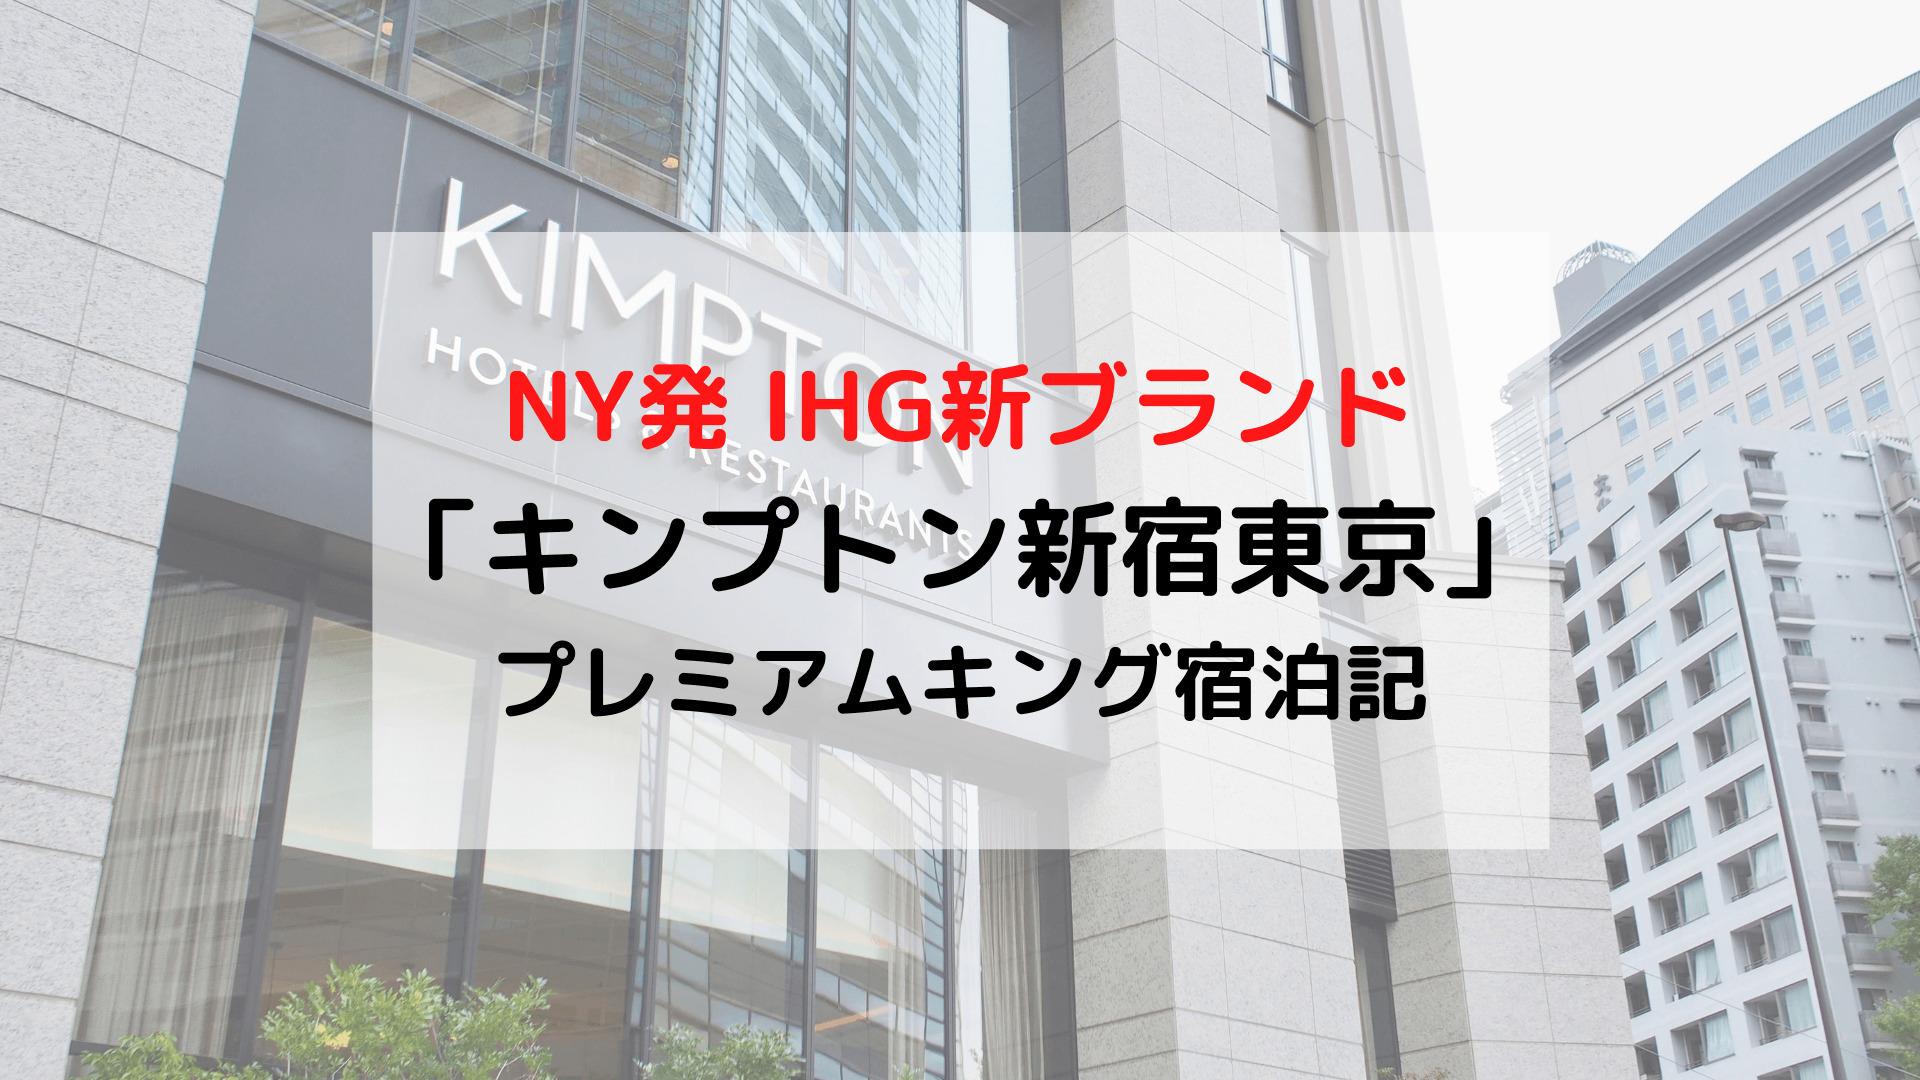 NY発 IHG新ブランド 「キンプトン新宿東京」 宿泊記